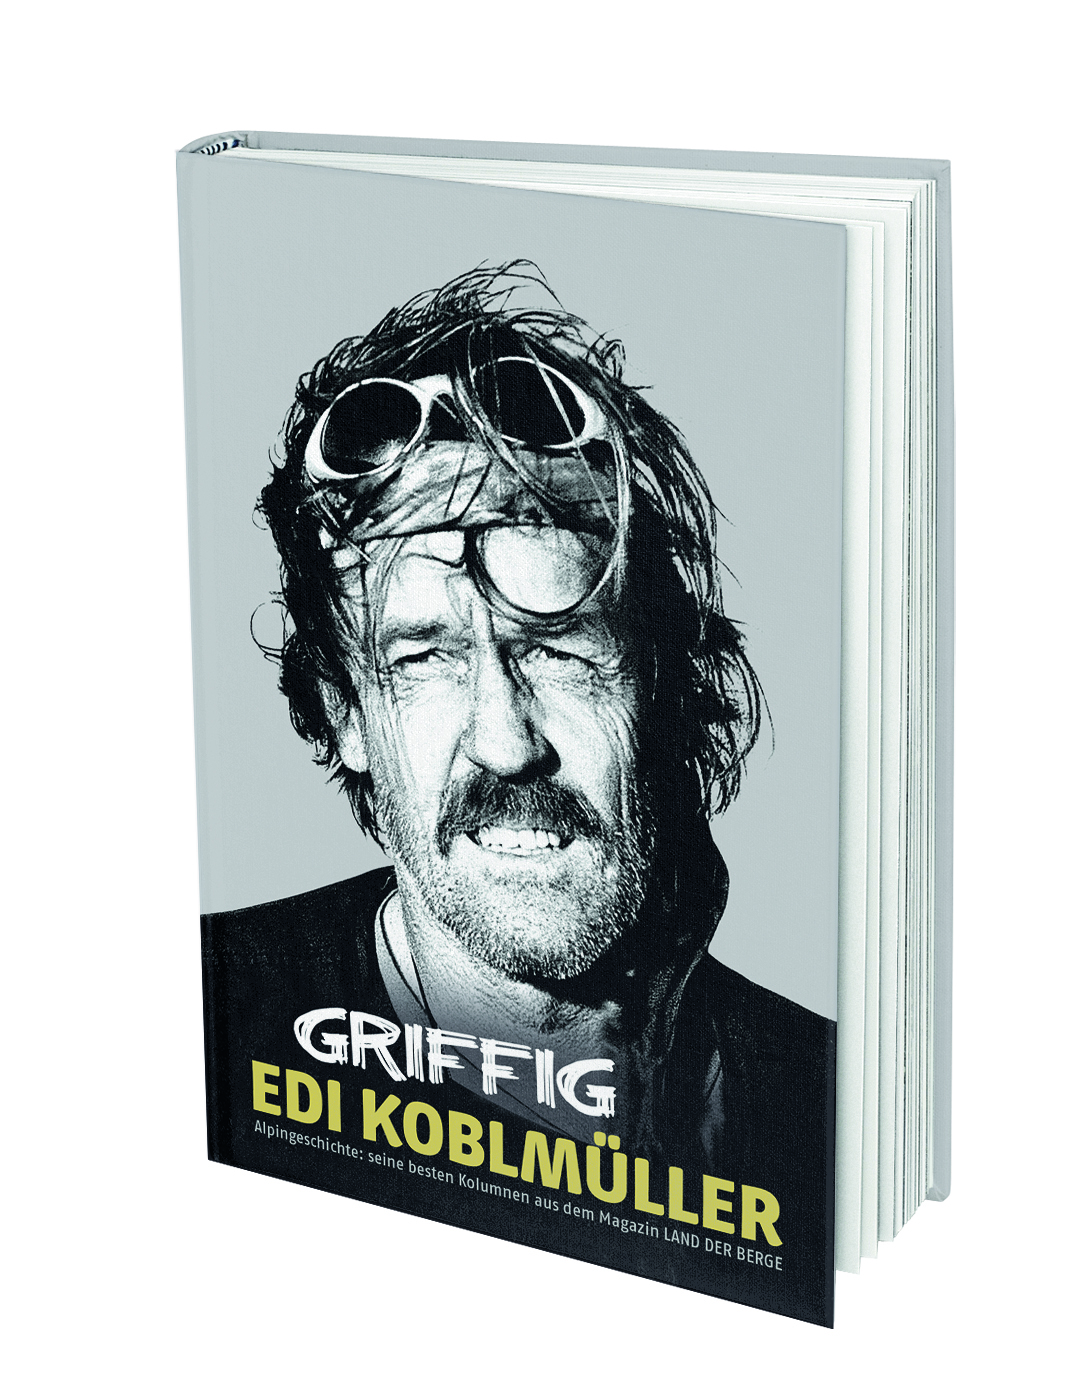 edi_koblmueller_griffig_cover